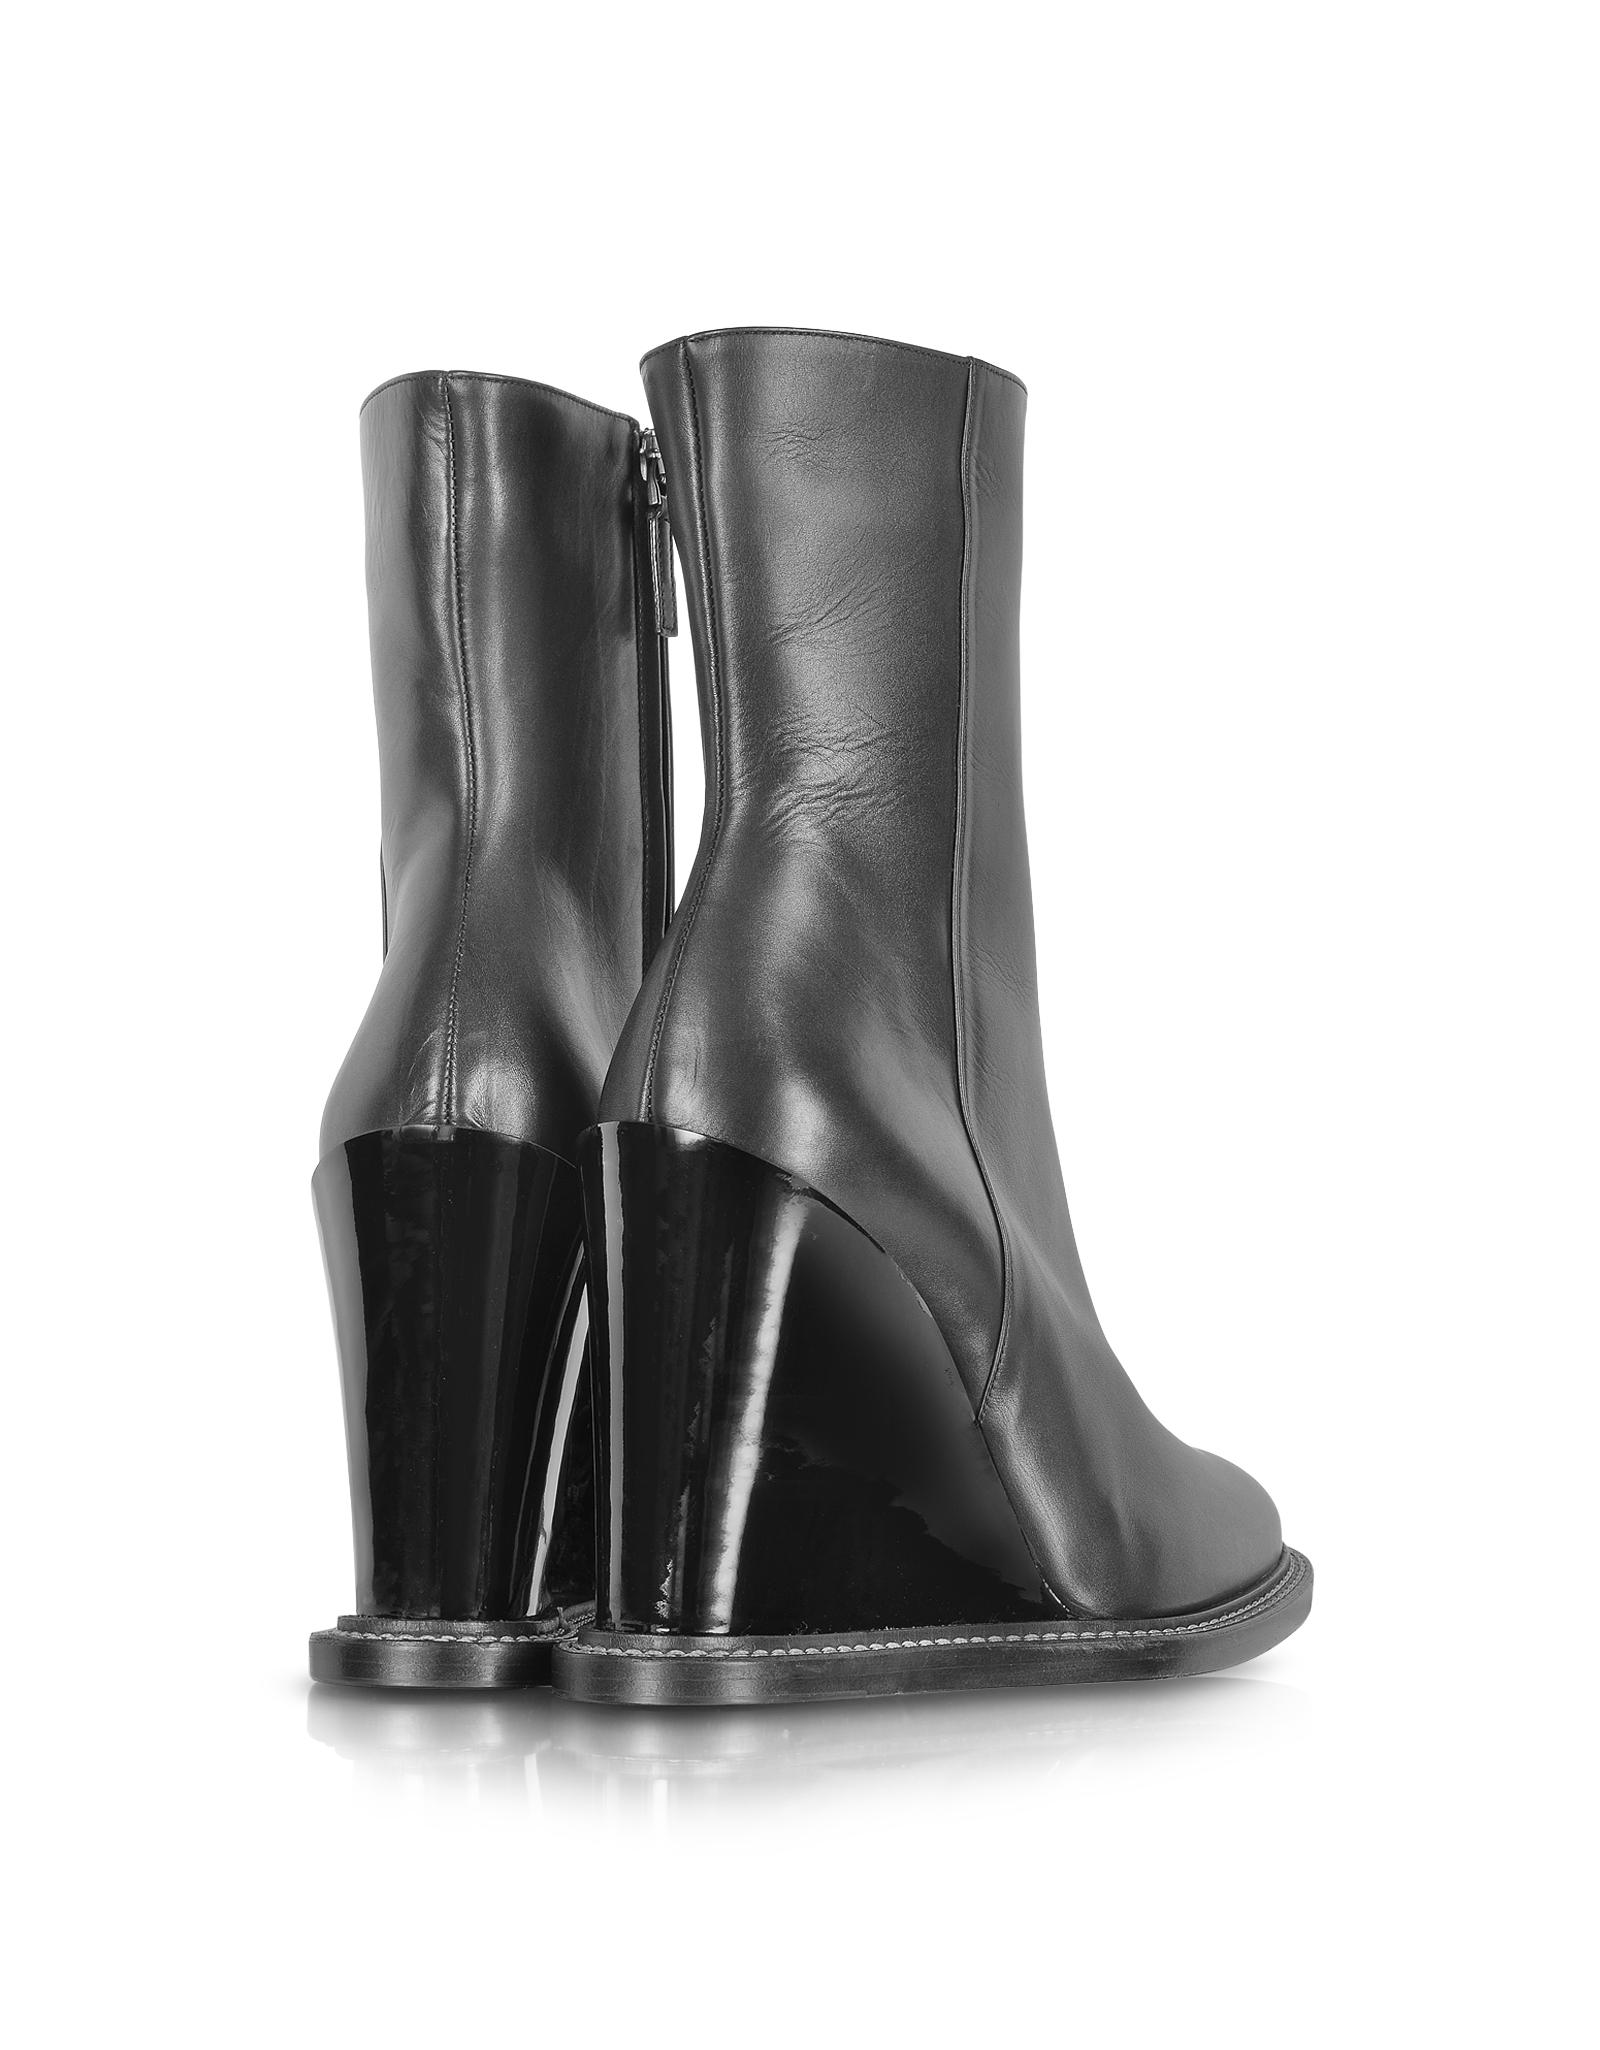 Jil sander Black Leather Wedge Ankle Boot in Black | Lyst